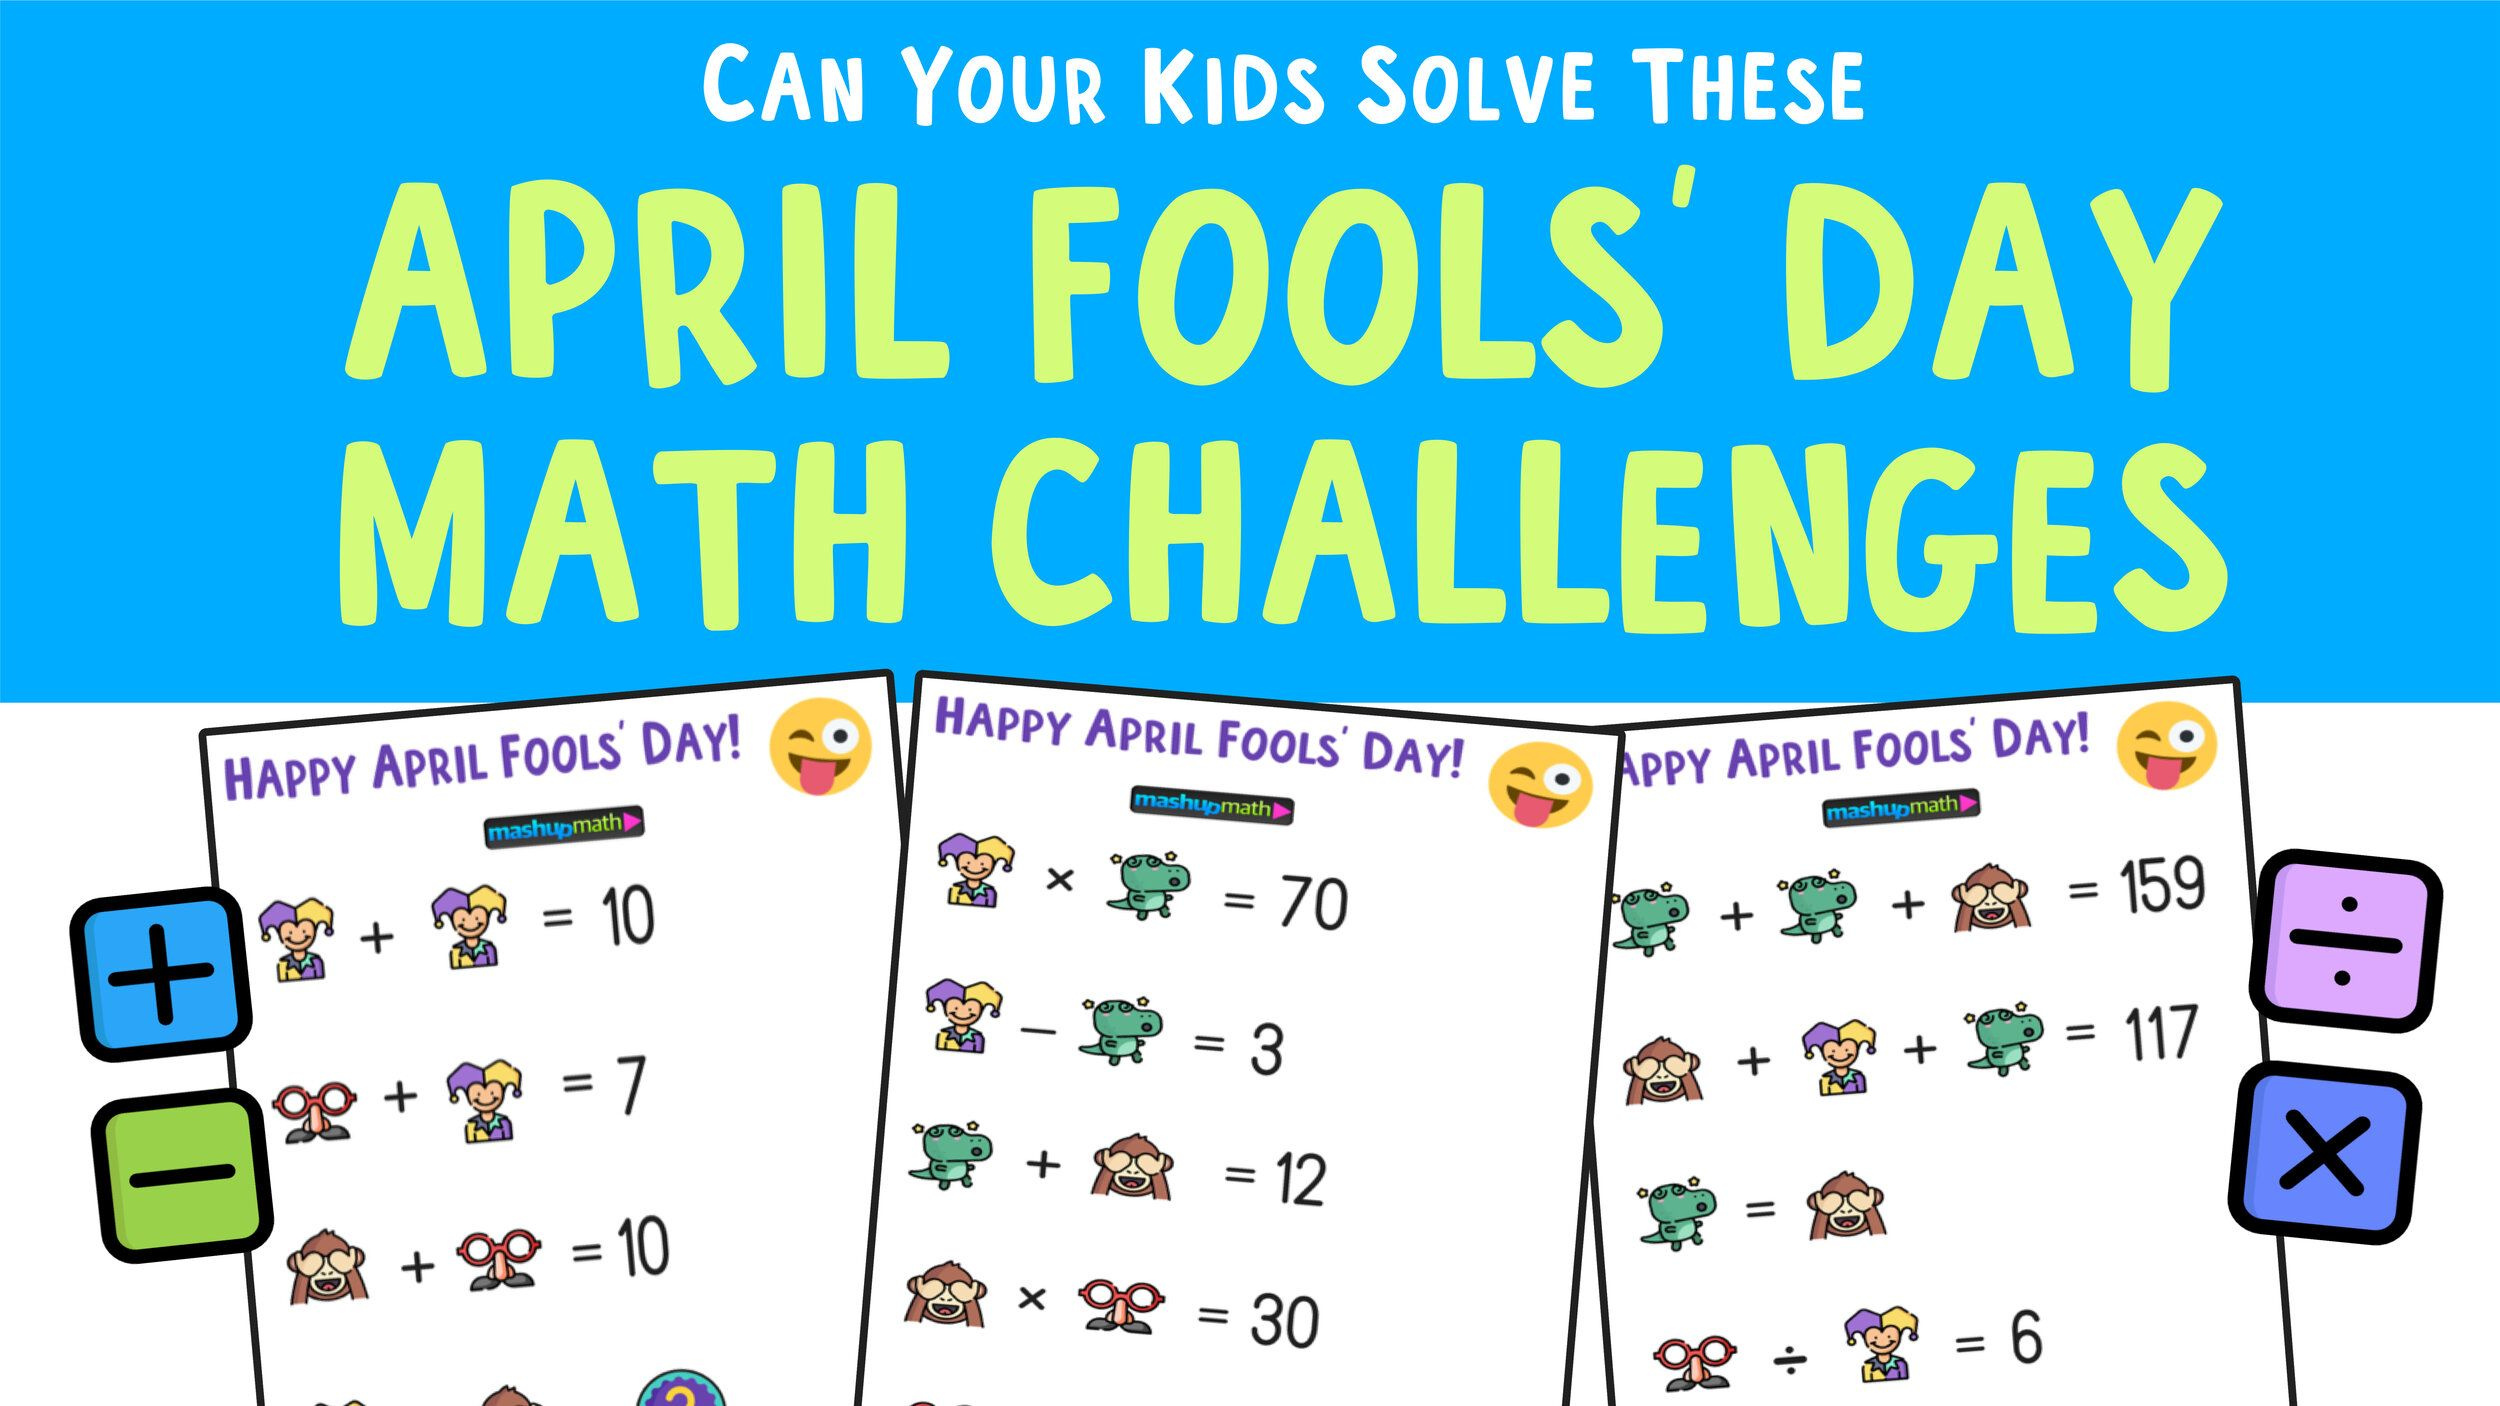 April Fools Day Math Puzzle For Grades 1 6 Mashup Math Maths Puzzles Free Math Math [ 1406 x 2500 Pixel ]